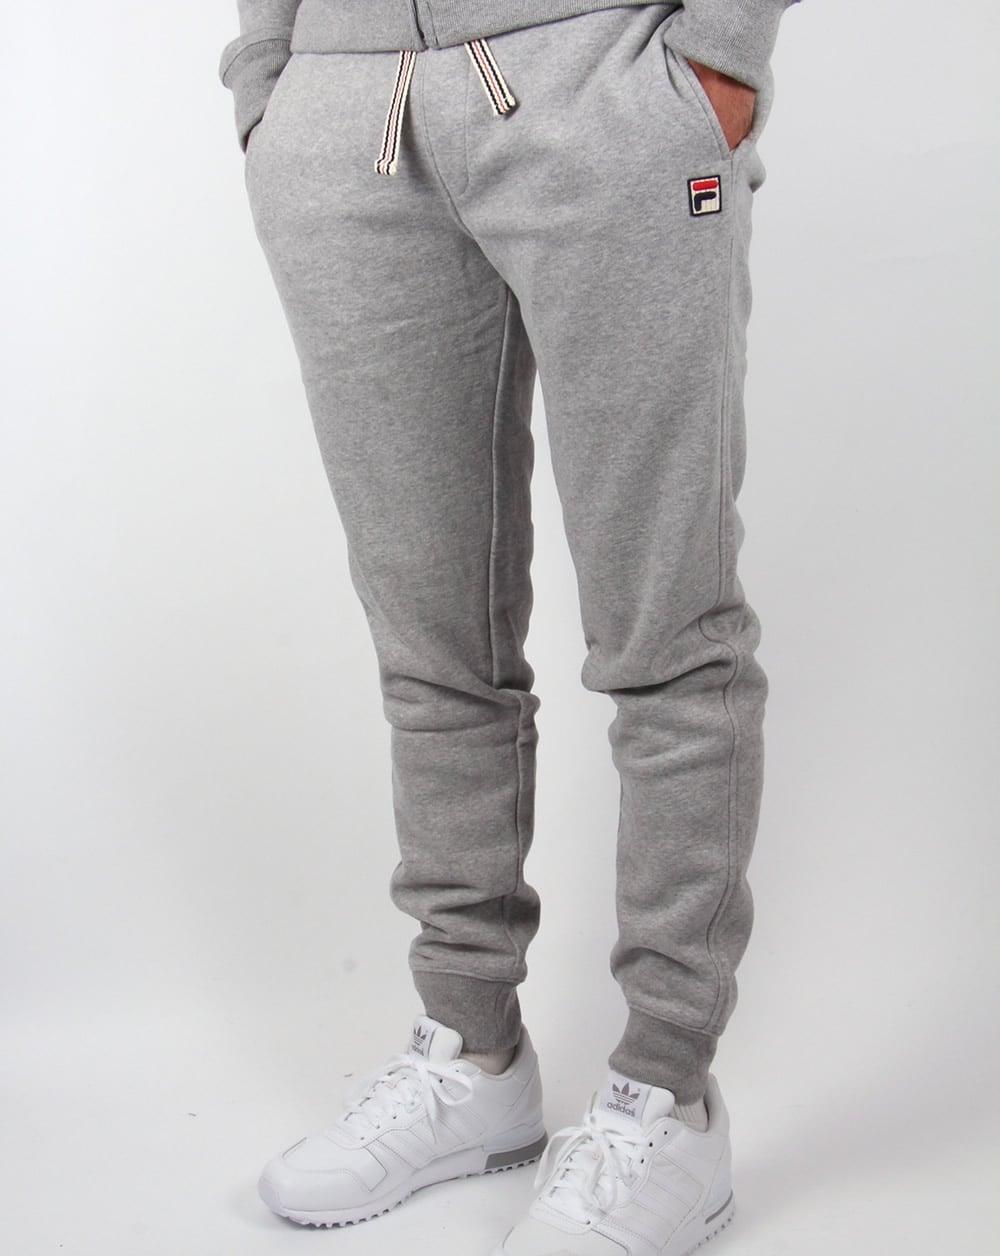 03baf69096c30 Fila Vintage Livata Cuffed Track Pants Grey,bottoms,tracksuit,mens